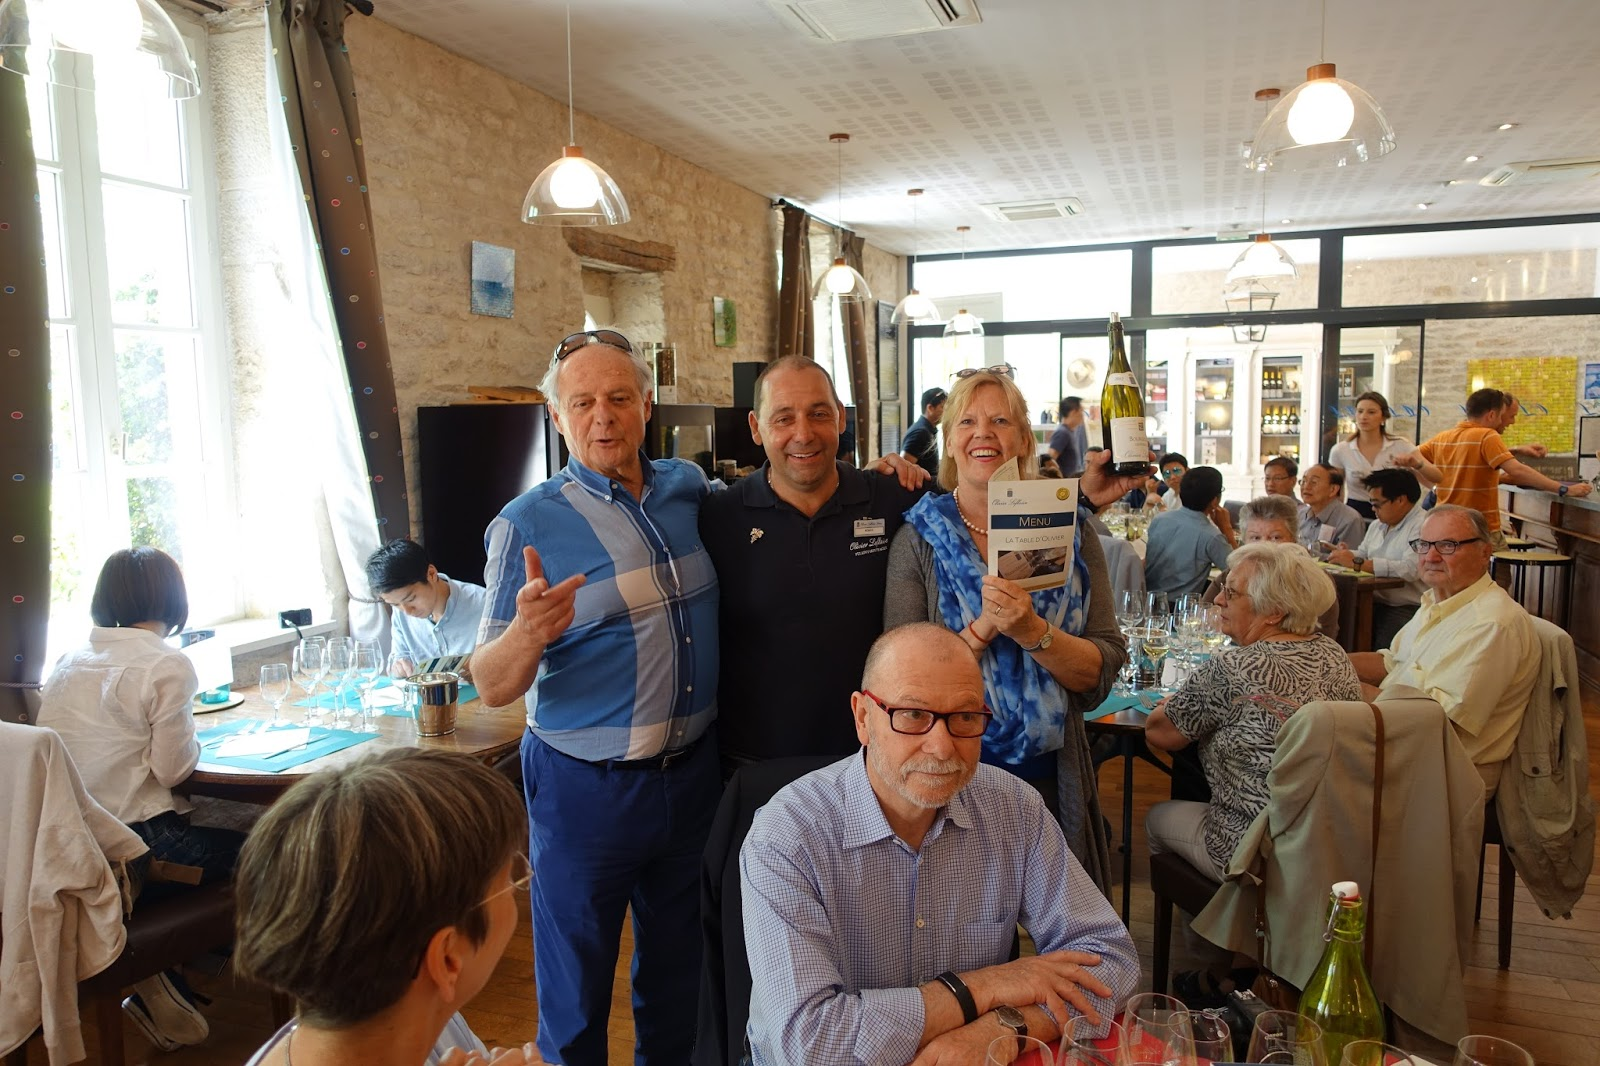 Schiller wine lunch and winetasting at la table de - La table d olivier leflaive puligny montrachet ...